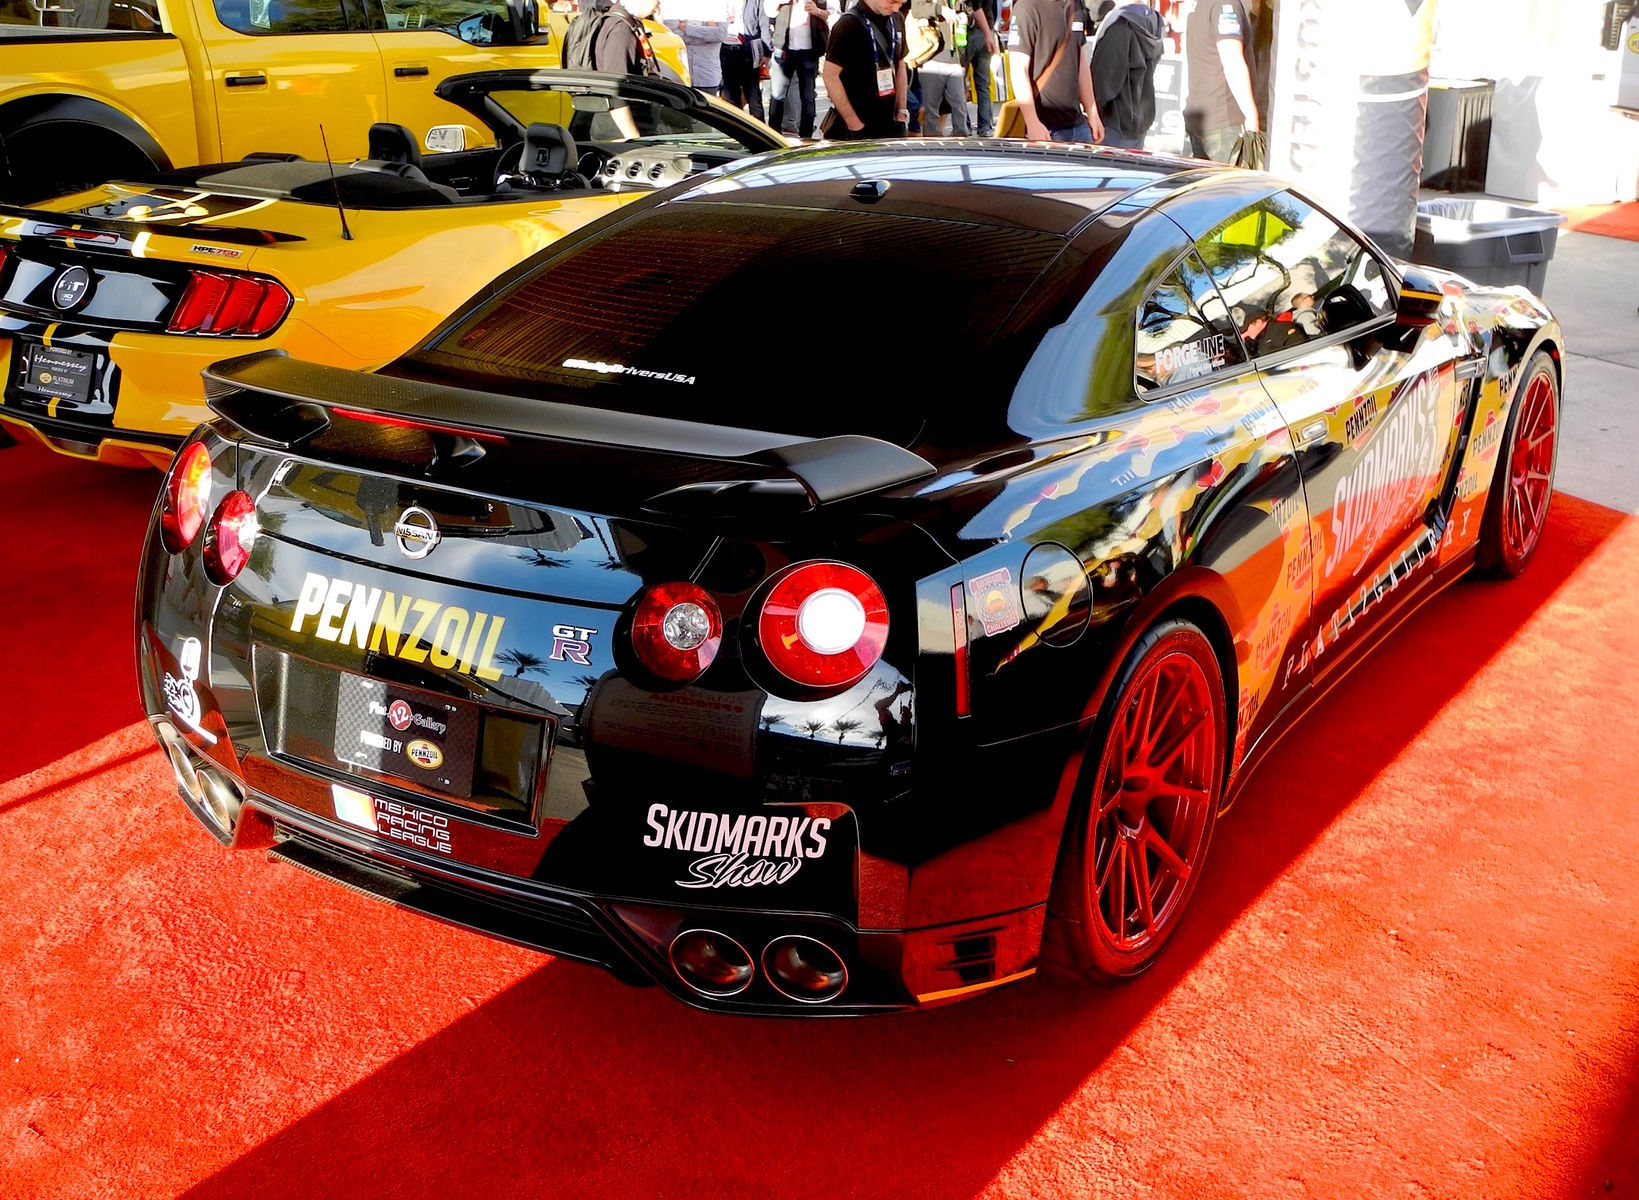 2014 Nissan GT-R   Flat 12 Gallery's